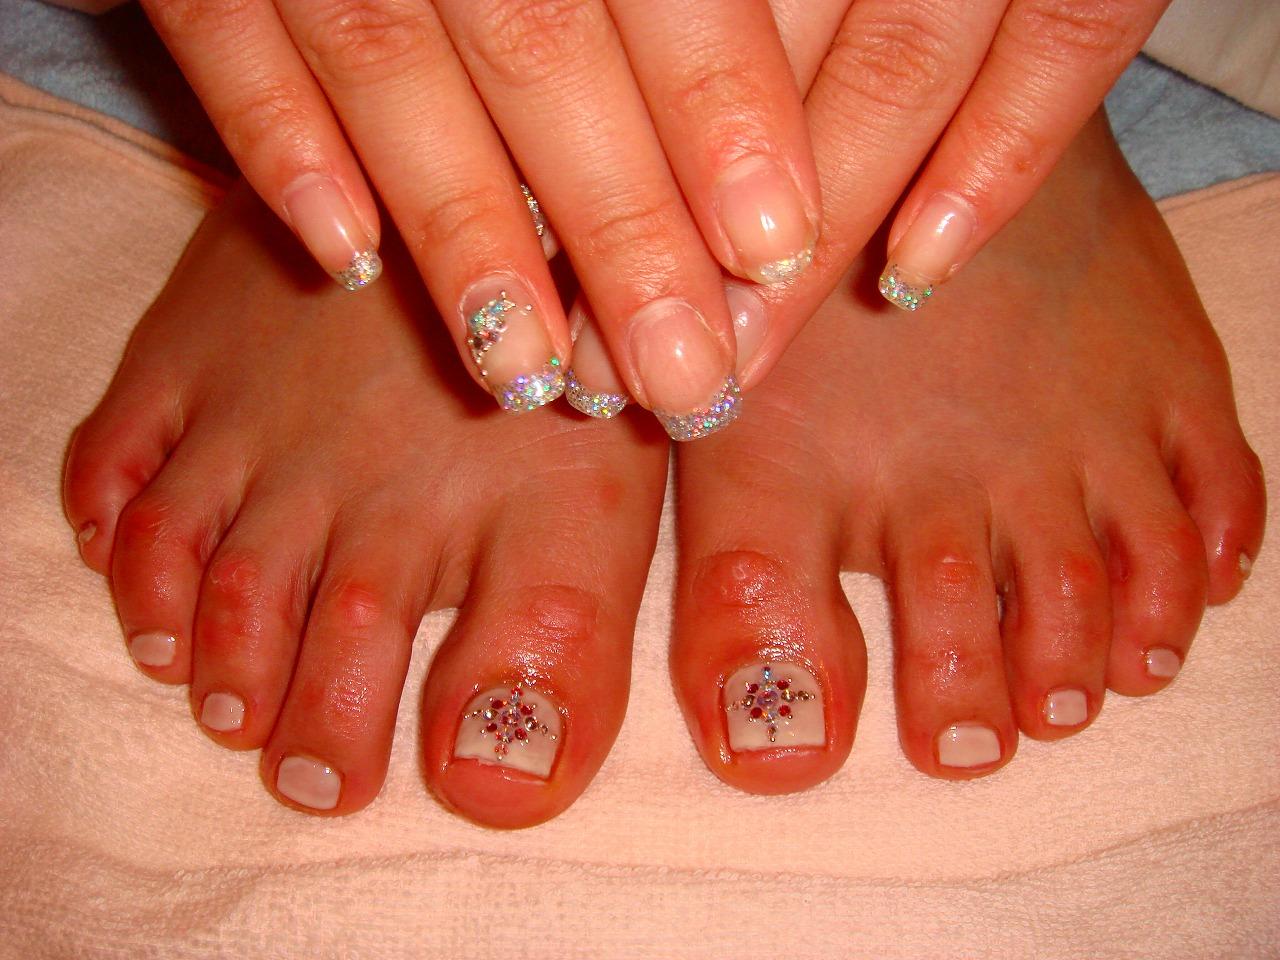 foot・バイオジェル_e0097047_3354213.jpg